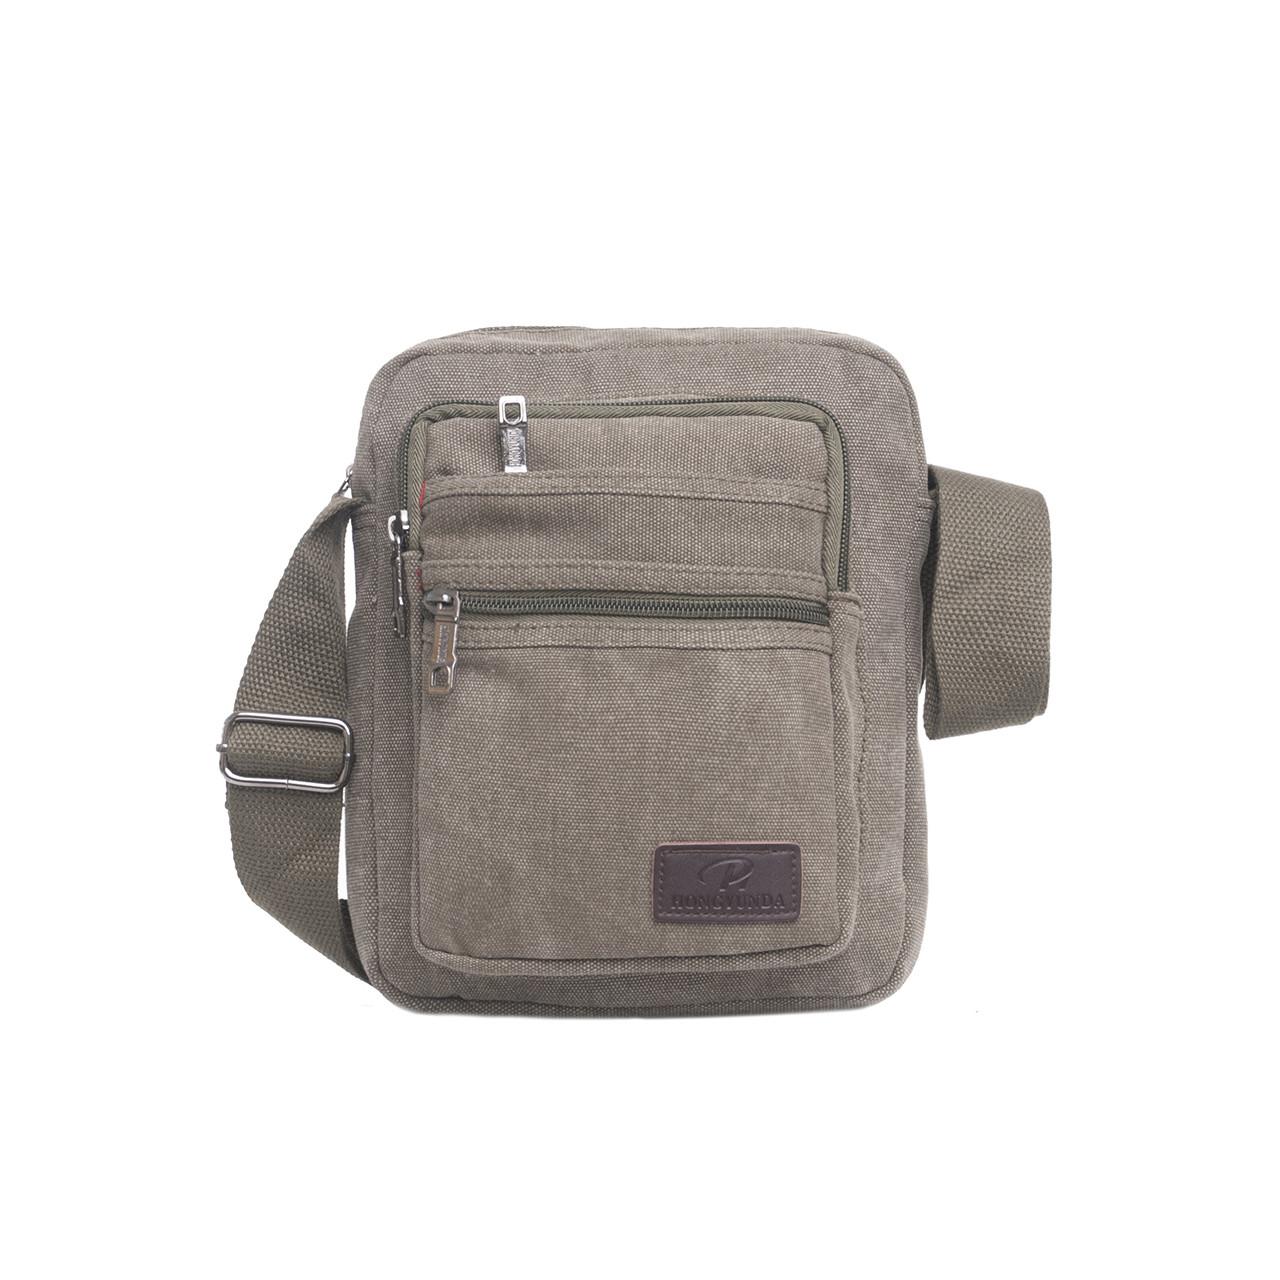 Чоловіча сумка вертикальна HONGYUNDA 18х23х9 матеріал брезент ксФ1518х